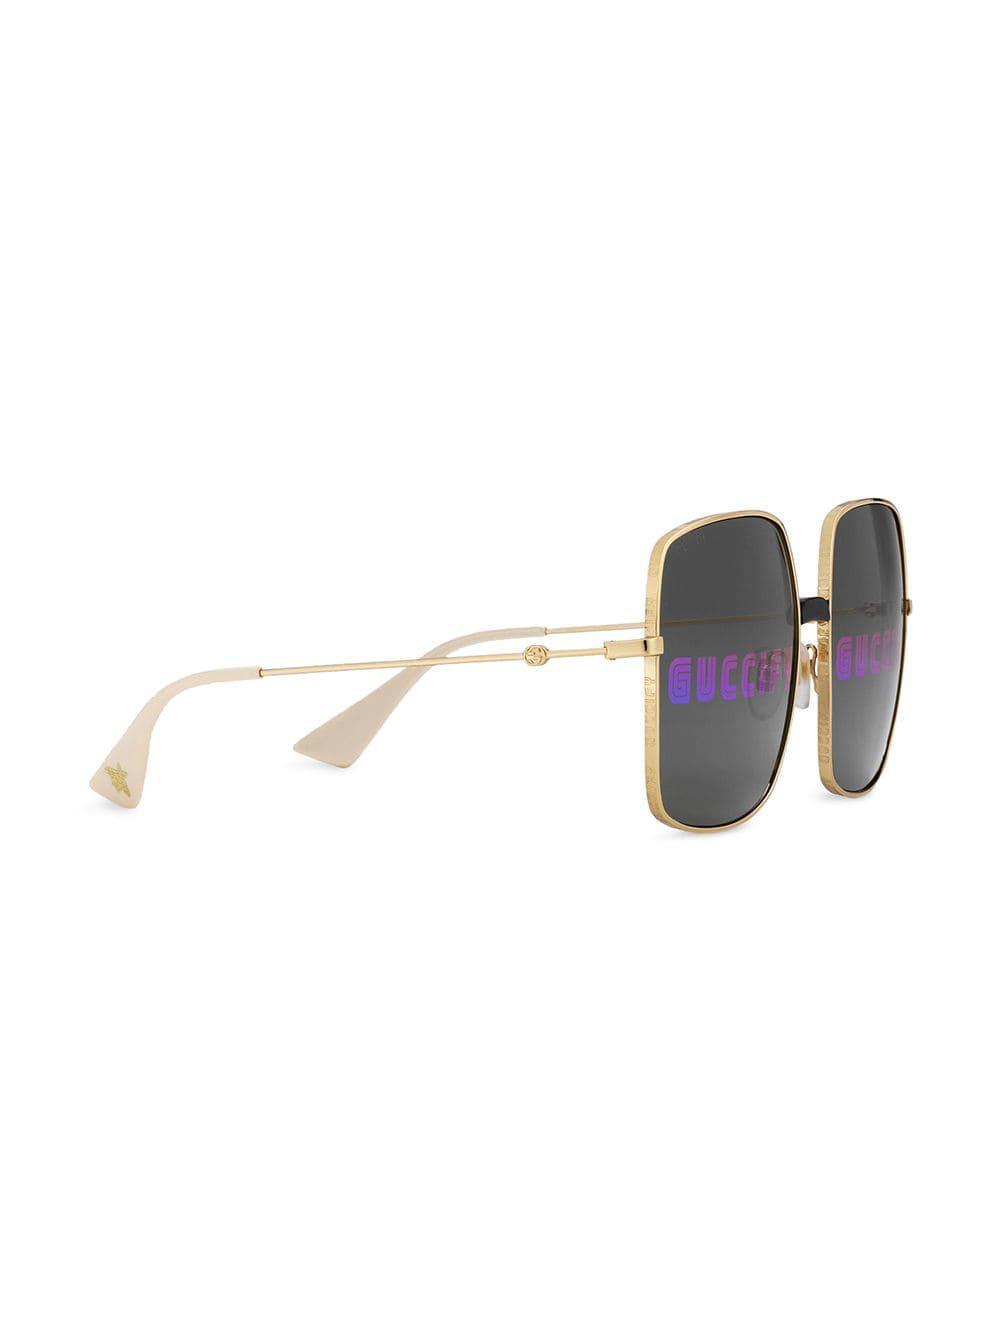 4617ae4744598 Lyst - Gucci Rectangular-frame Sunglasses in Metallic - Save  29.243697478991592%